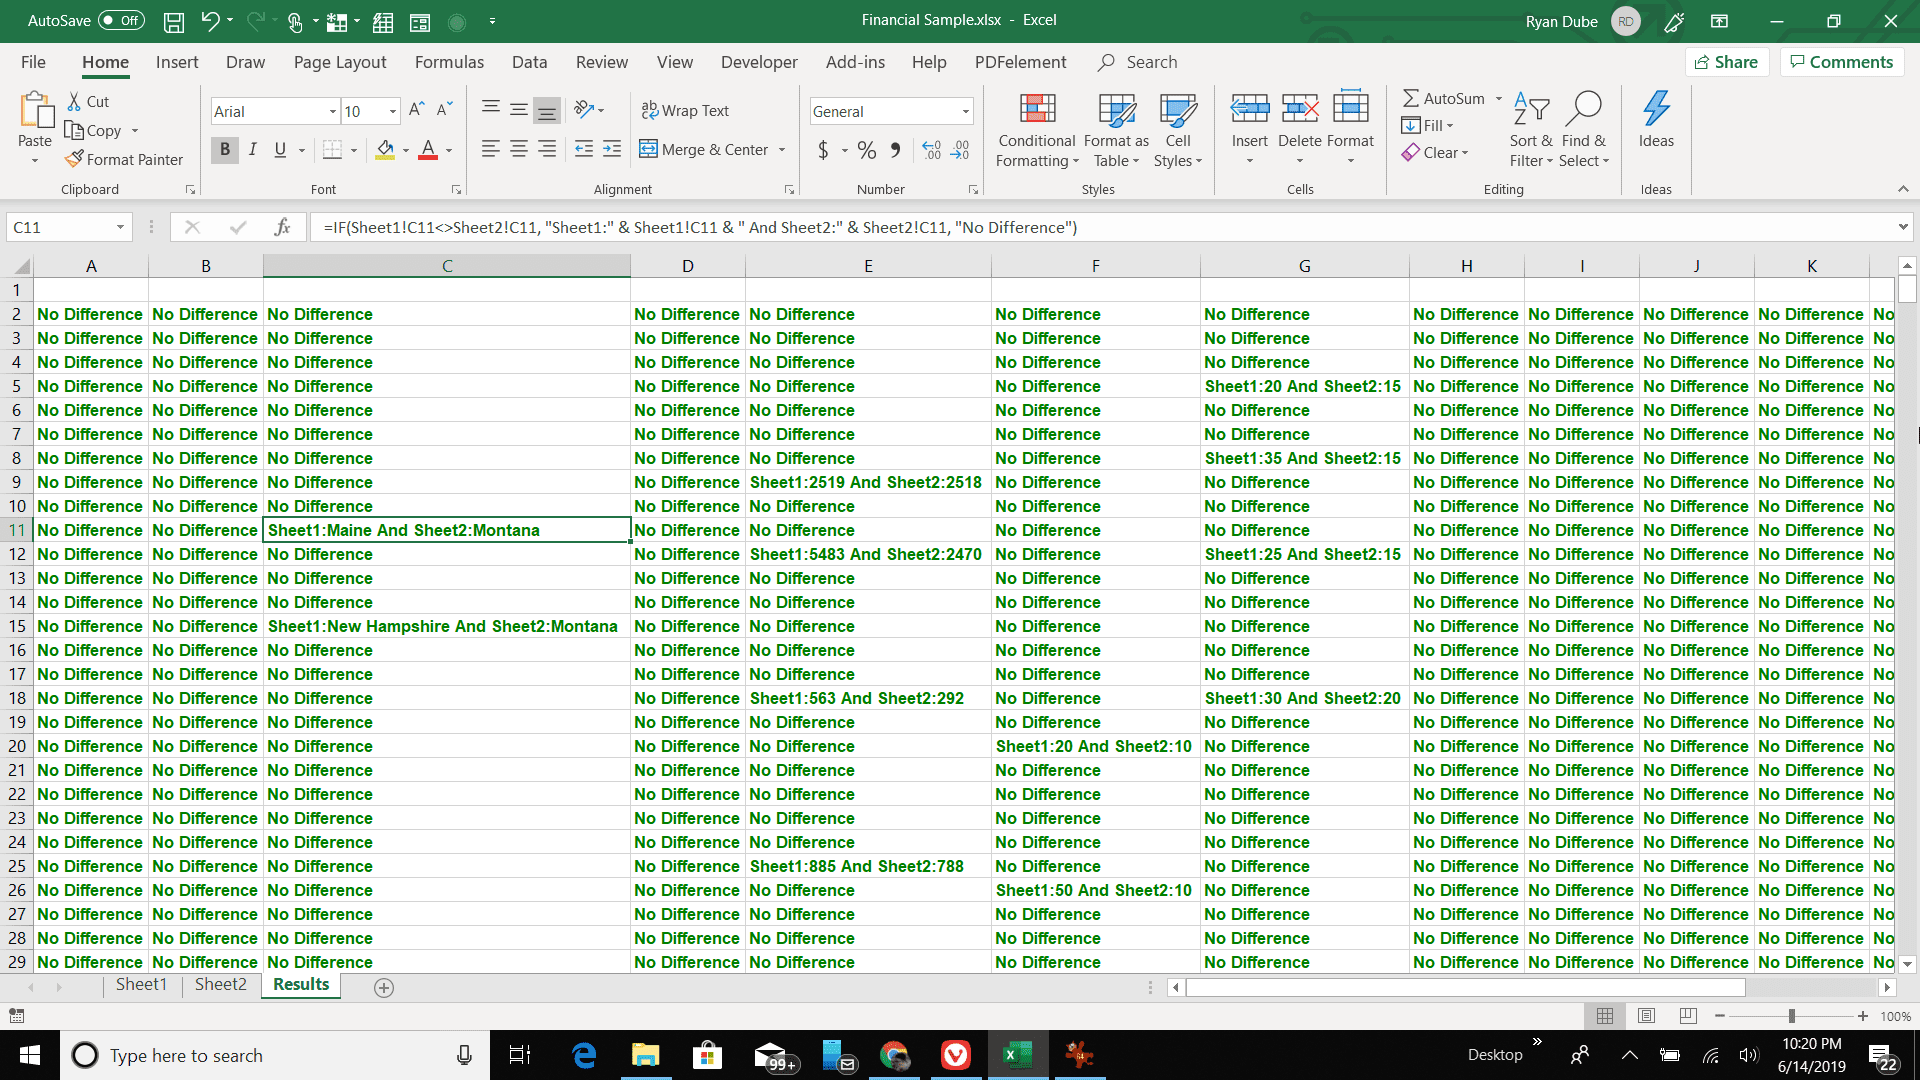 Screenshot of worksheet comparison results